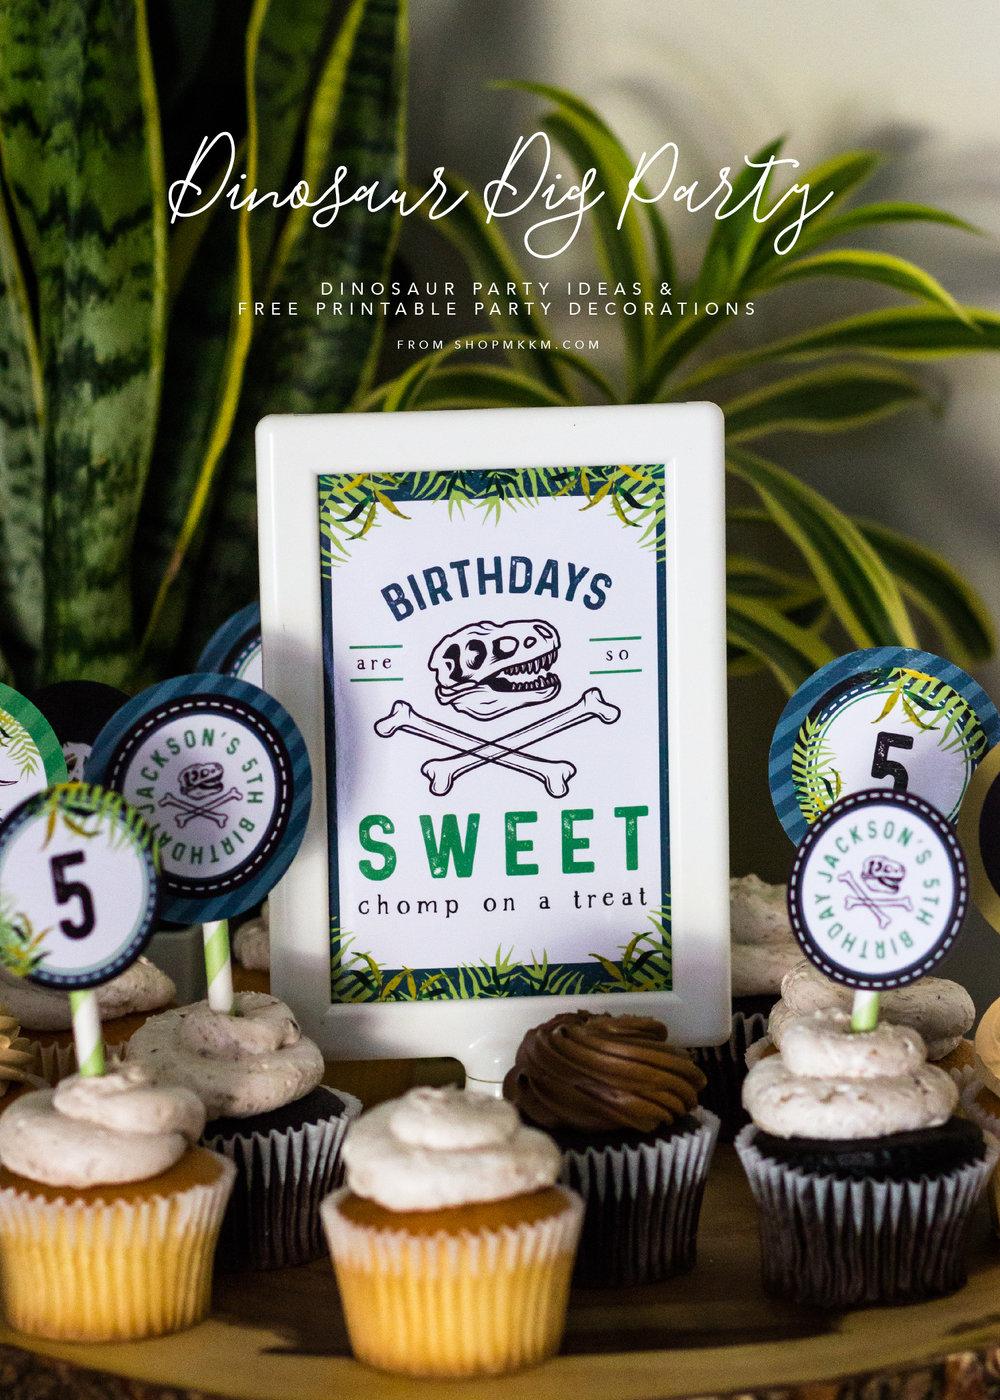 Dinosaur Dig Party. Dinosaur Party ideas and free printables from shopmkkm.com